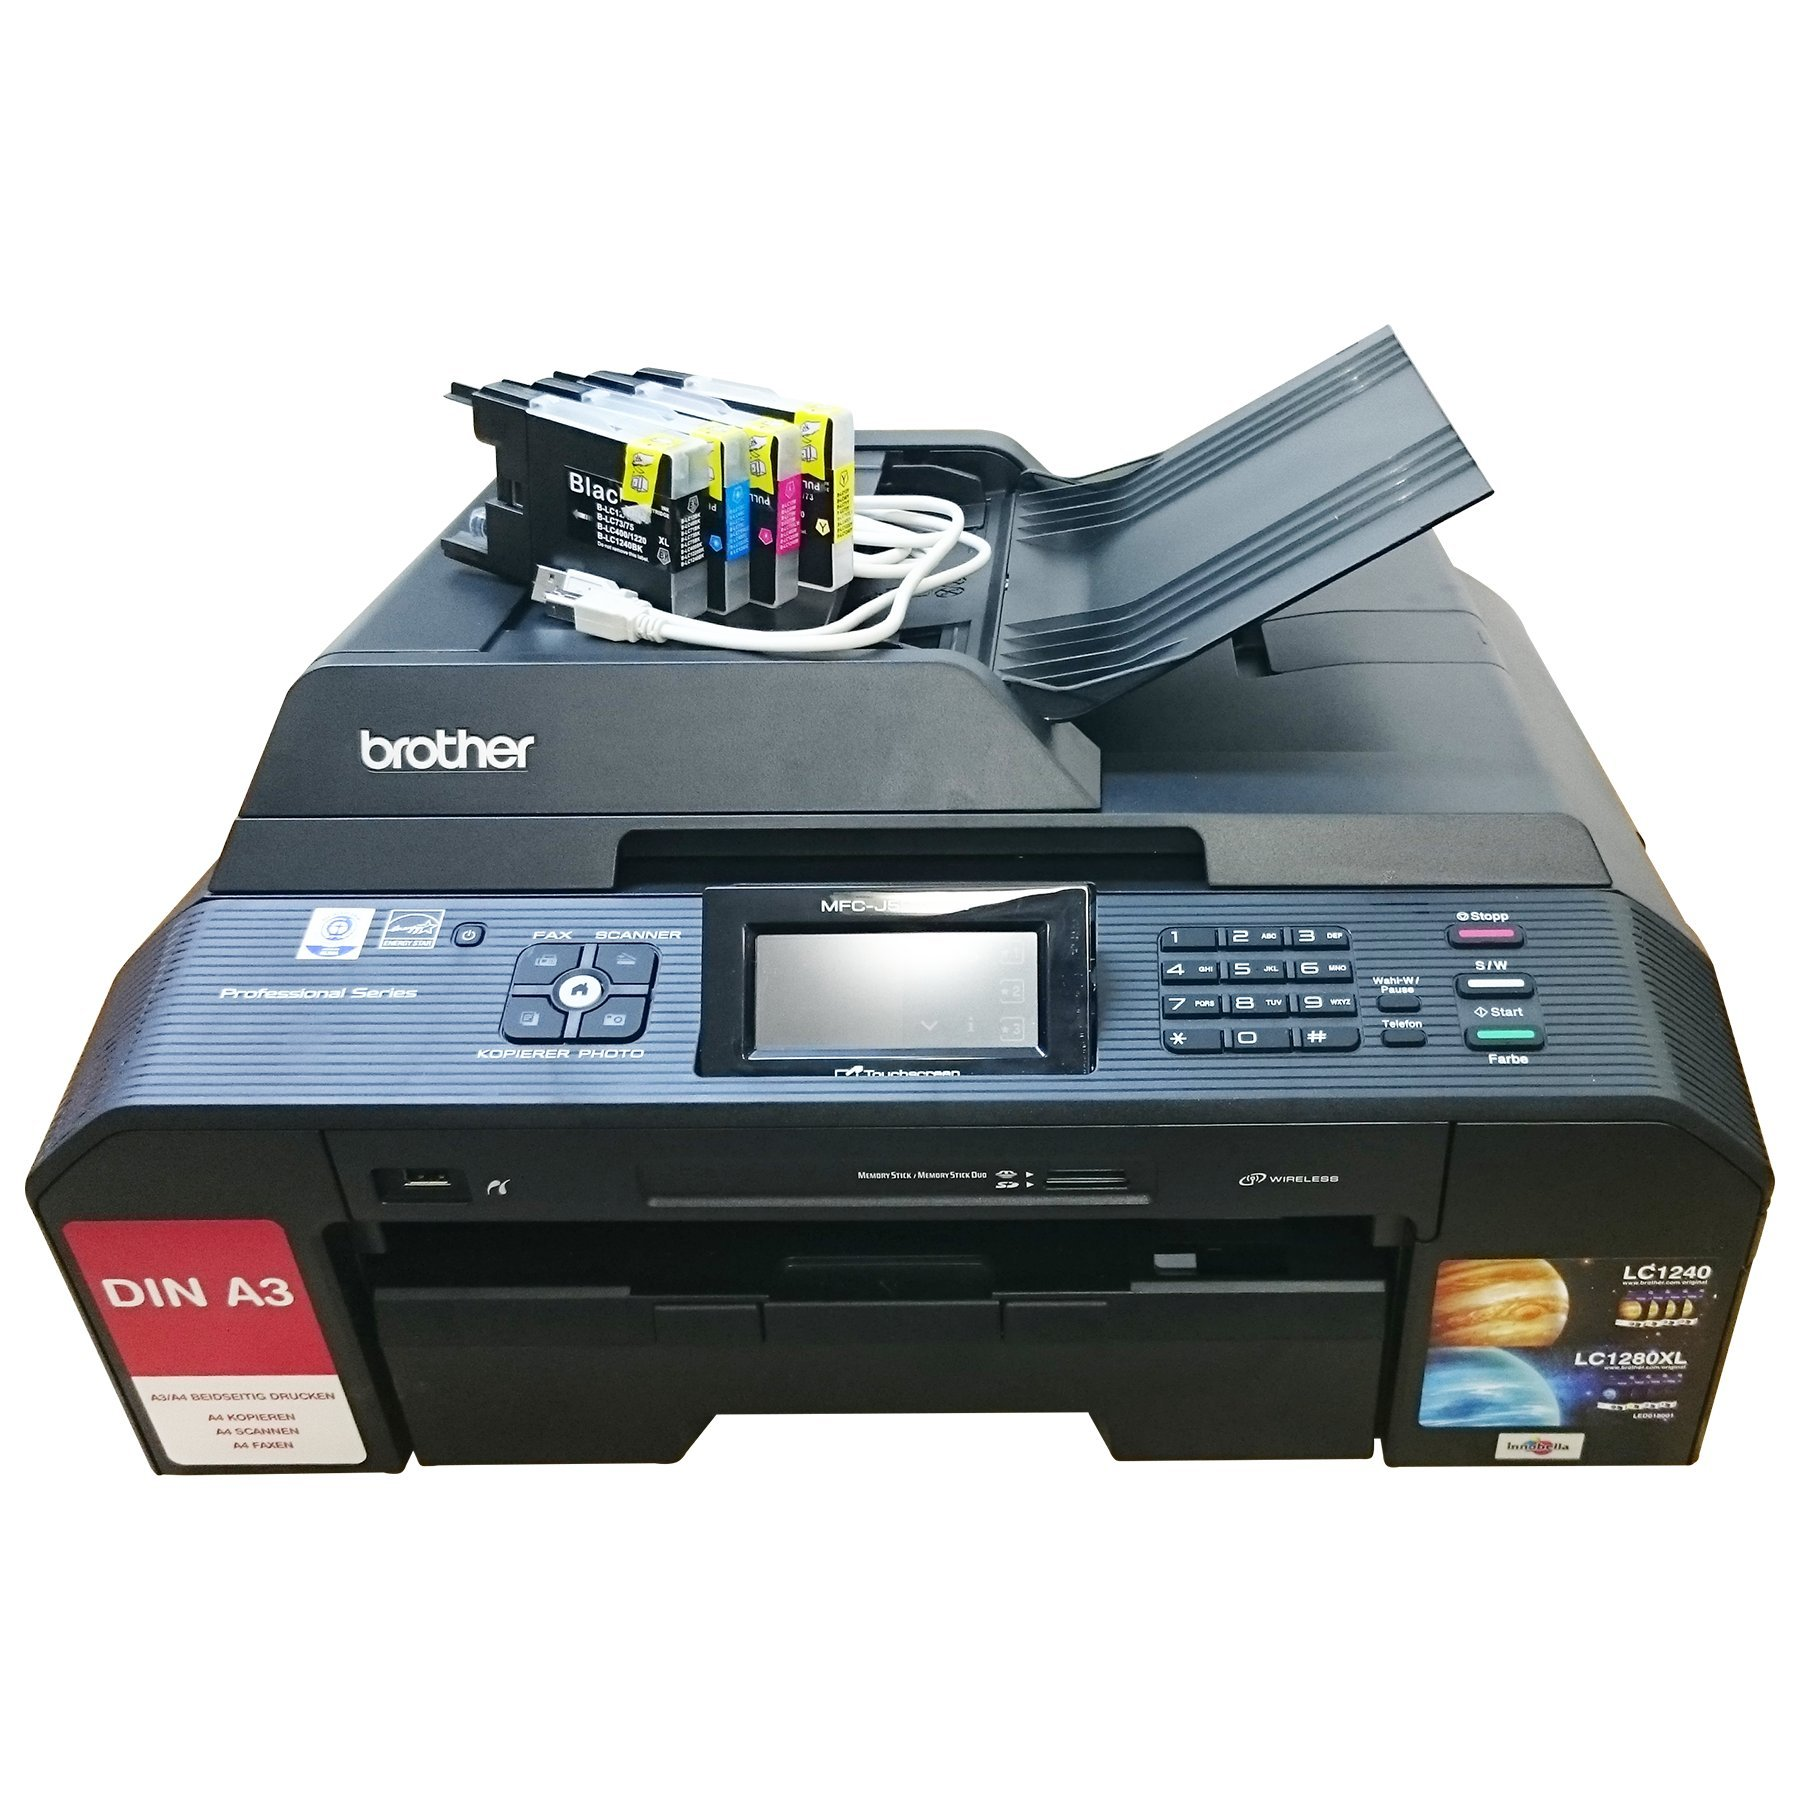 Brother MFC-J5910DW WLAN A3 multifunción Fax, escáner ...